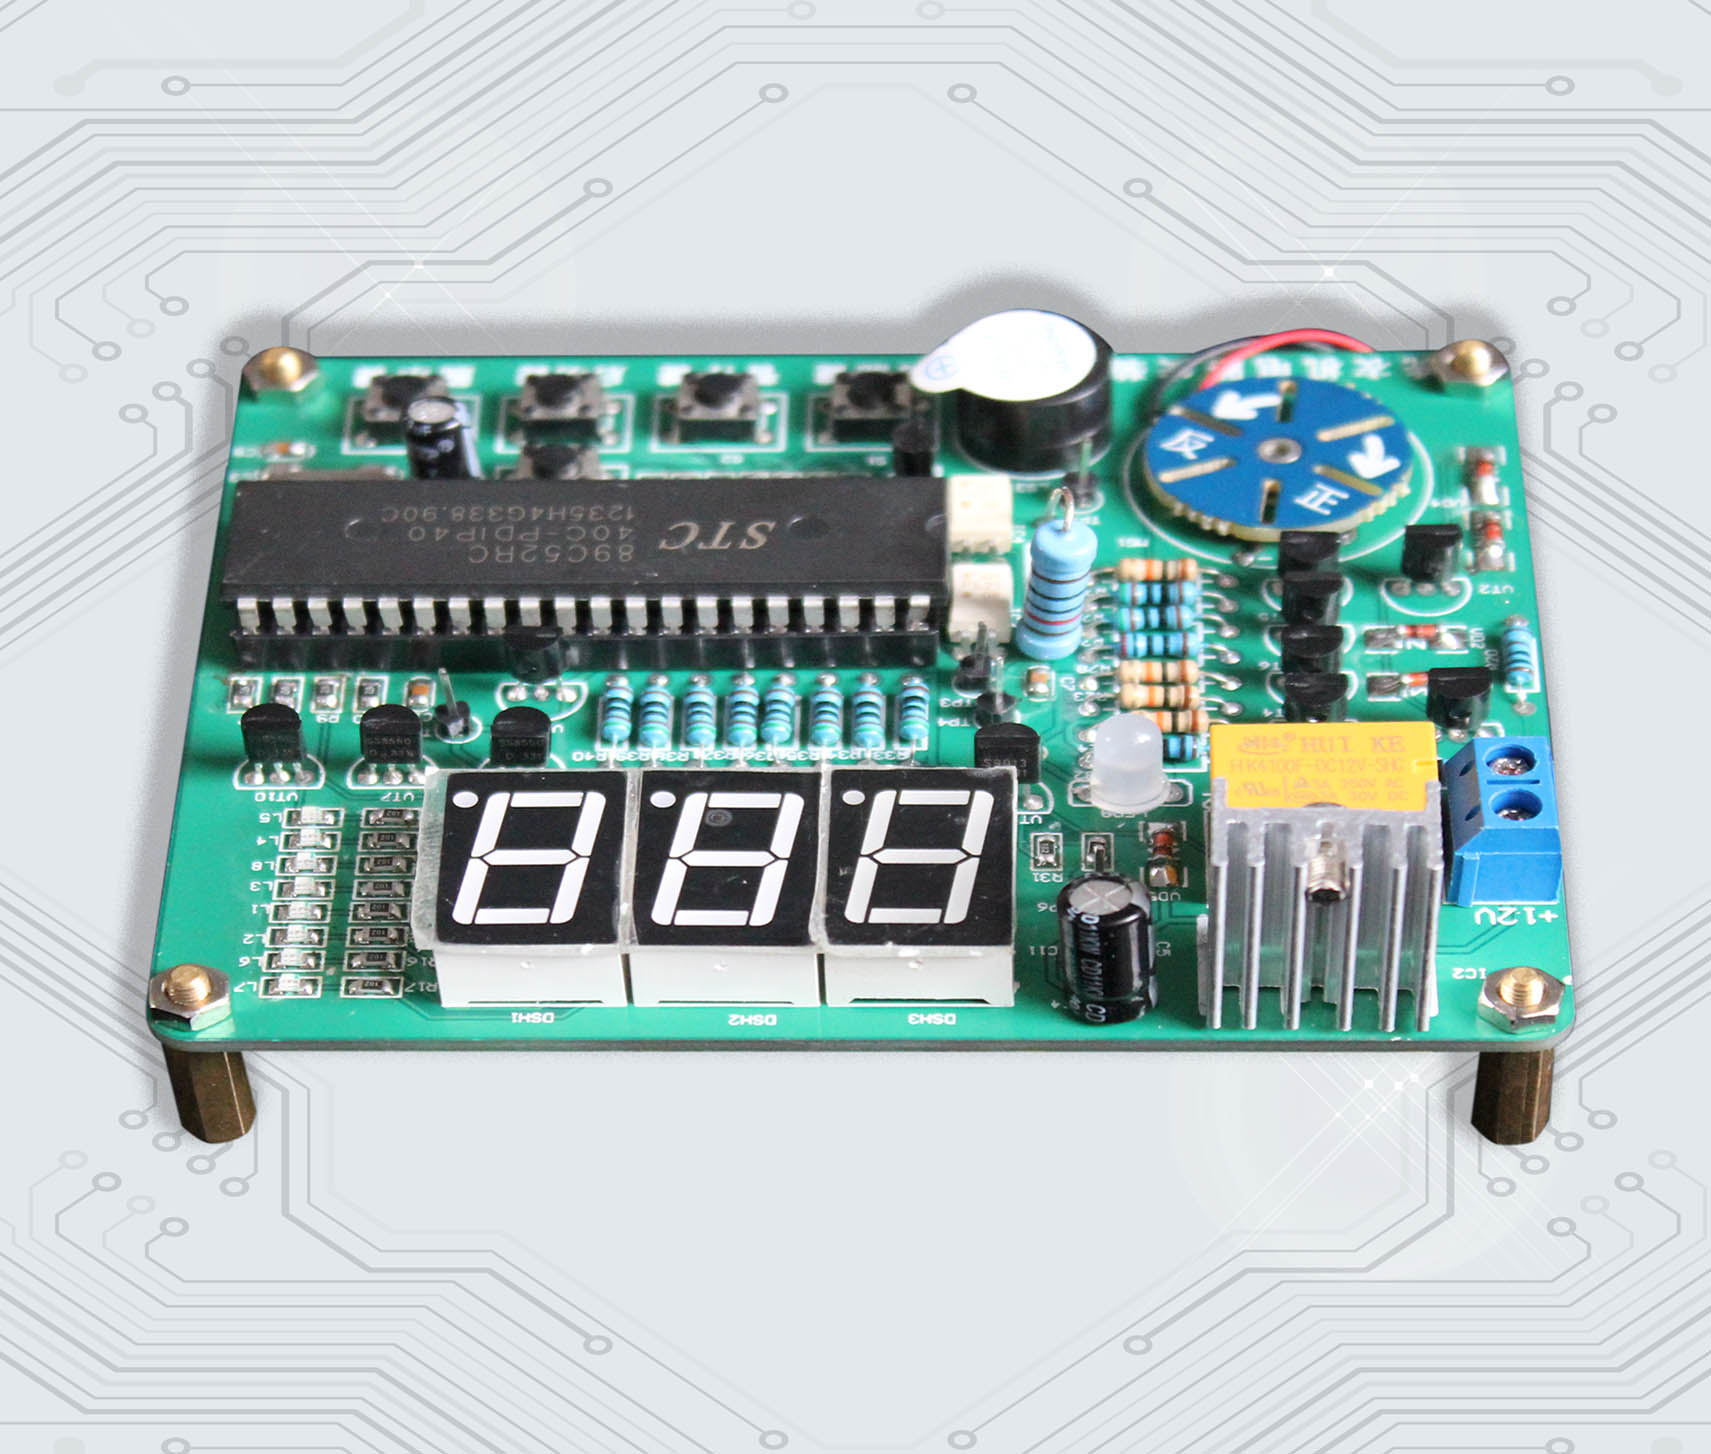 Analogue Washing Machine Electronic Assembly Kit Electronic Product Assembly Guide Book ...